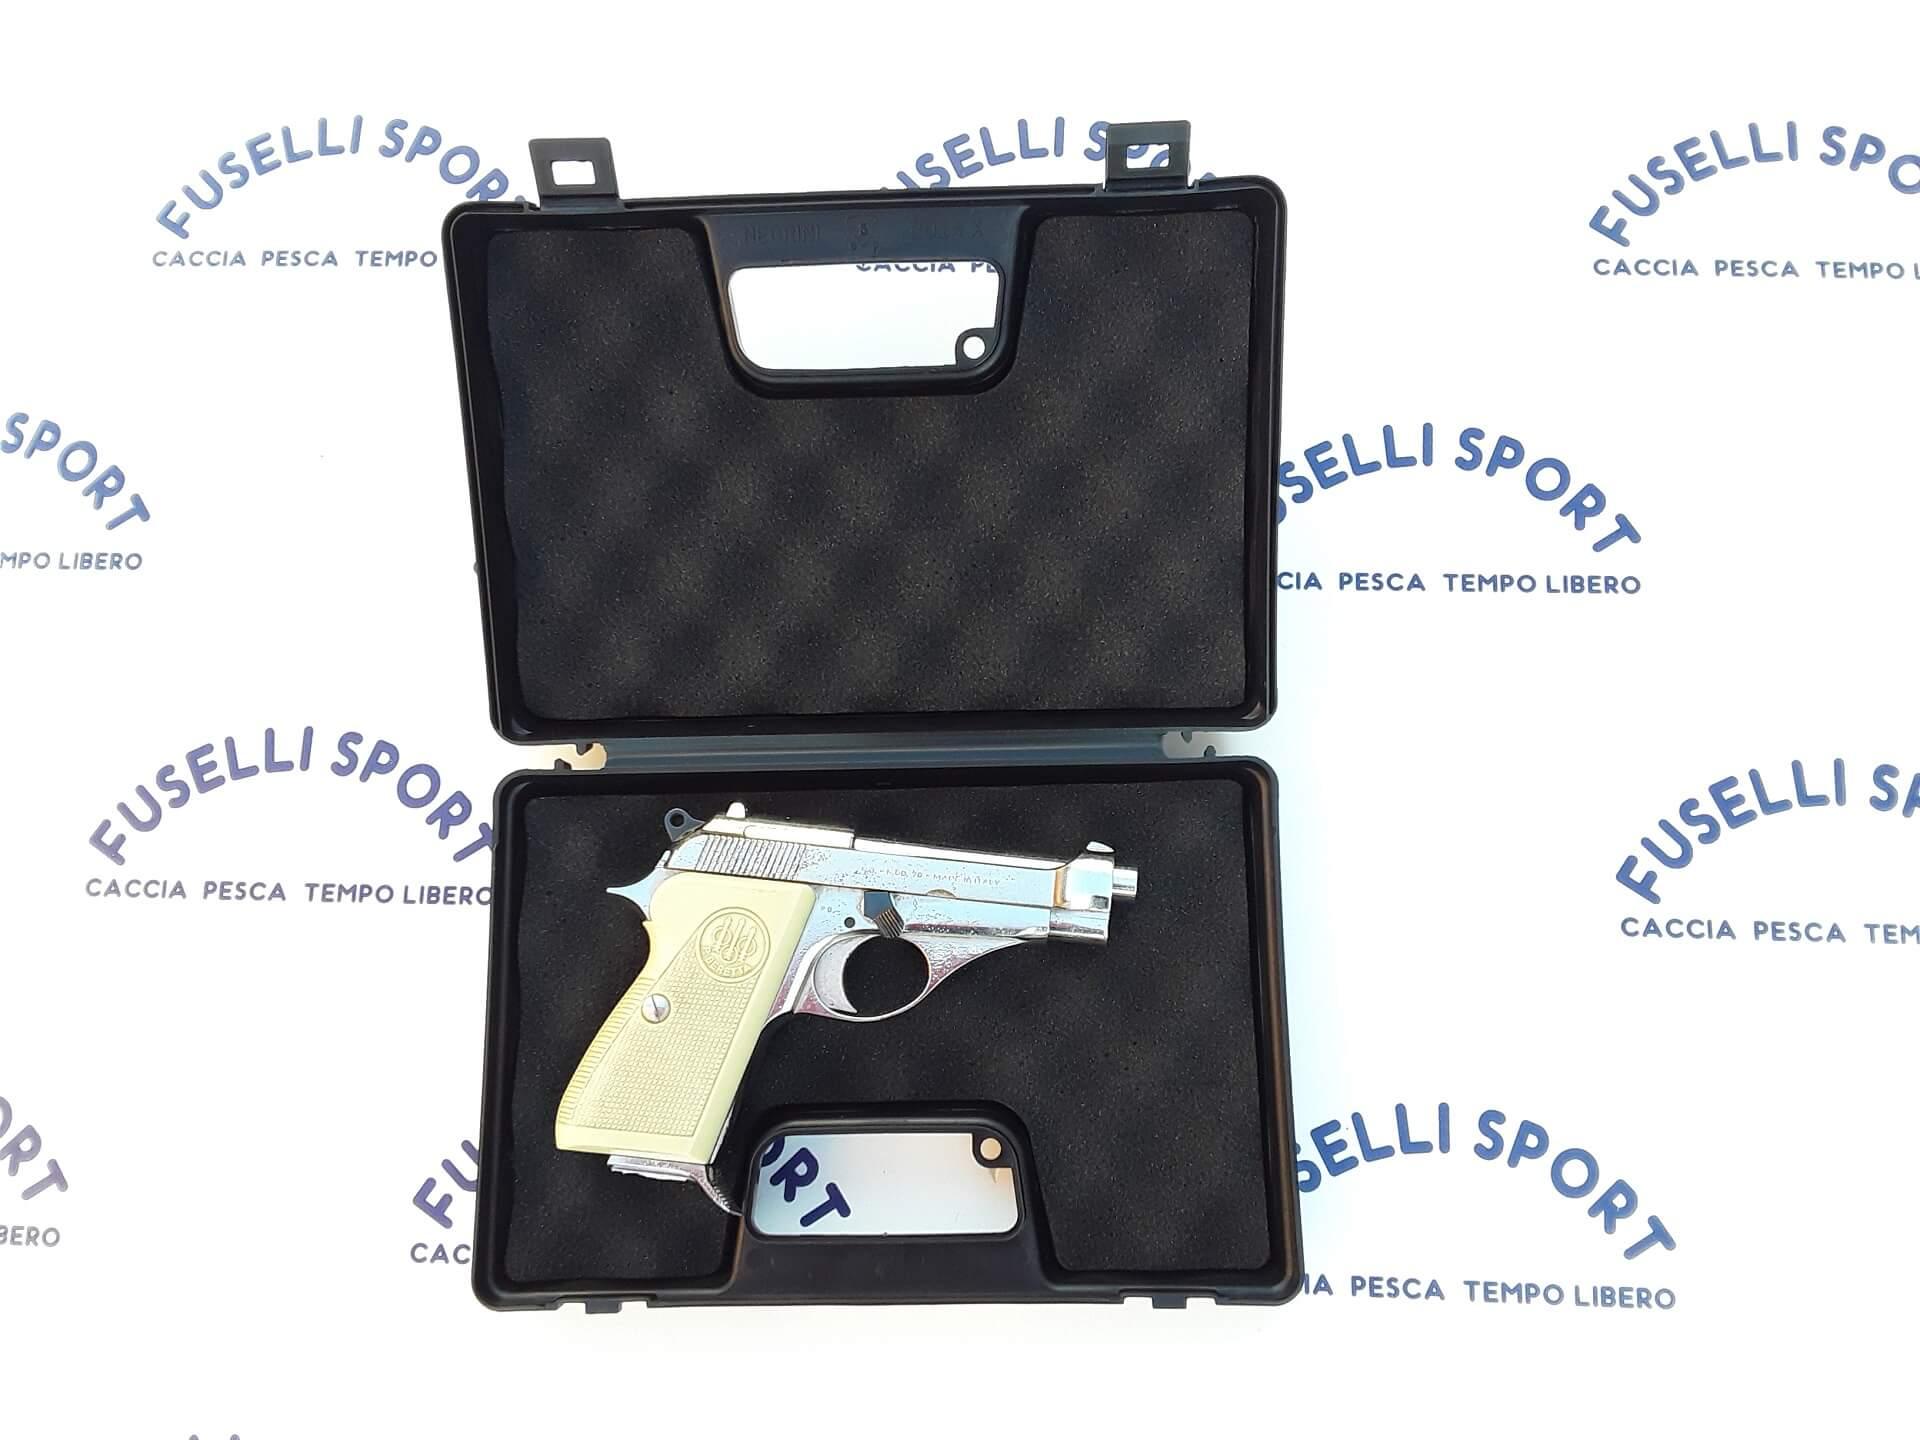 Pistola semiautomatica Beretta 70 cal 7,65